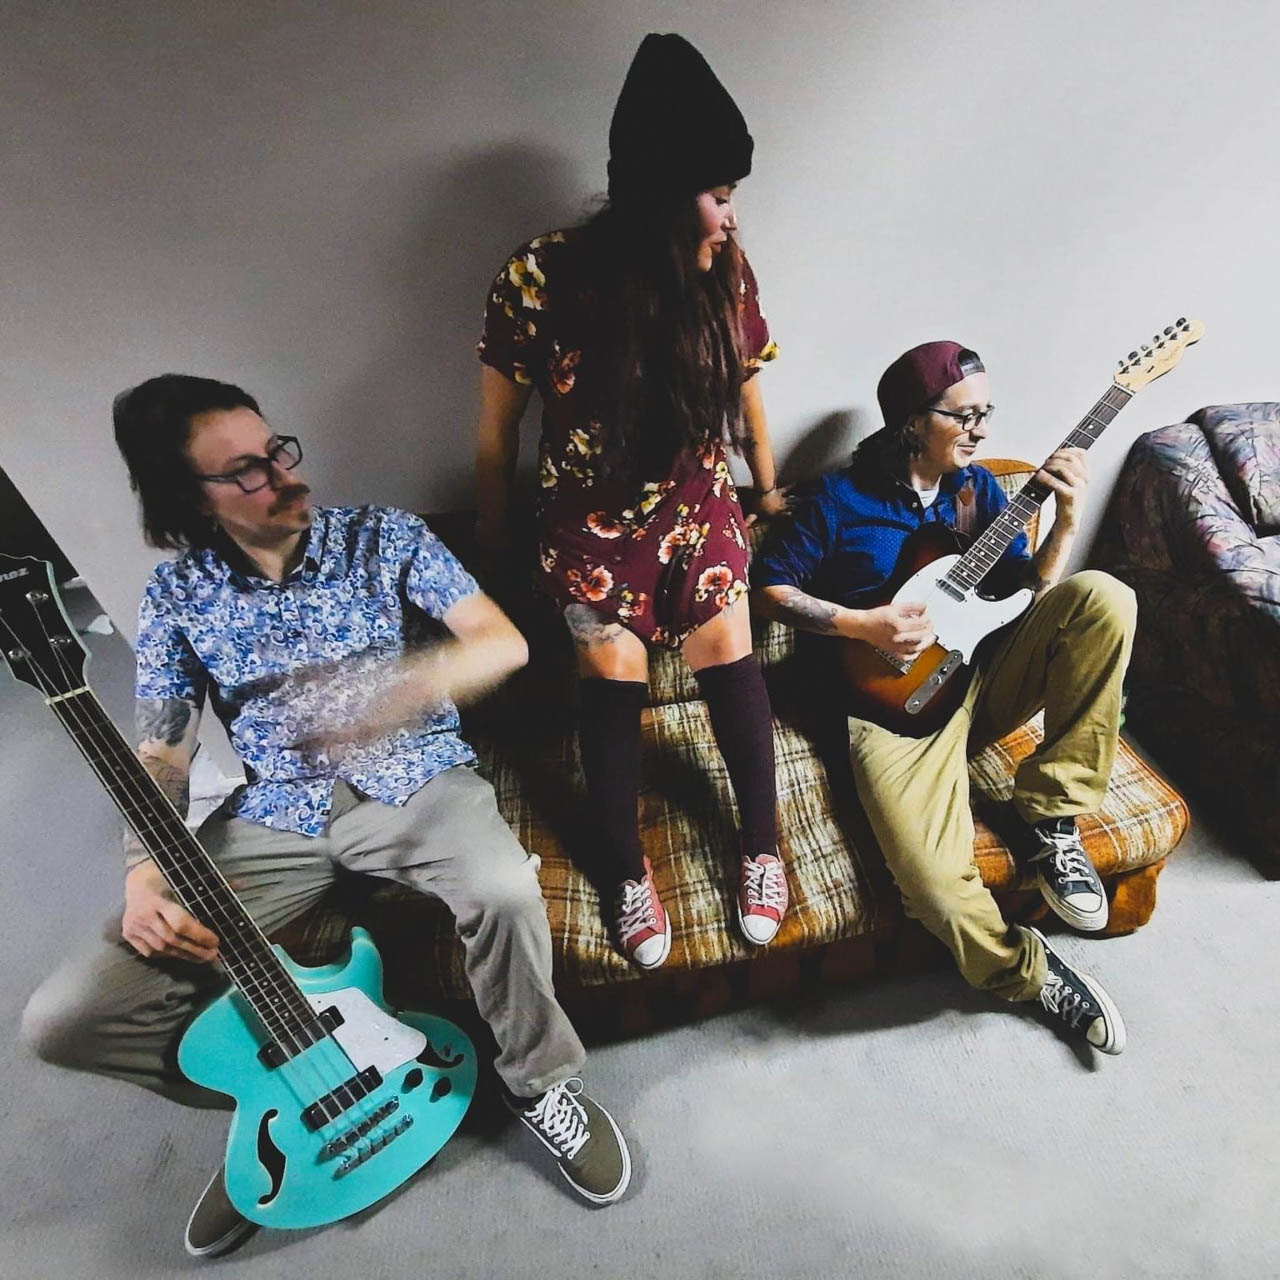 Les jeudis terrasse - The Leftovers (duo)